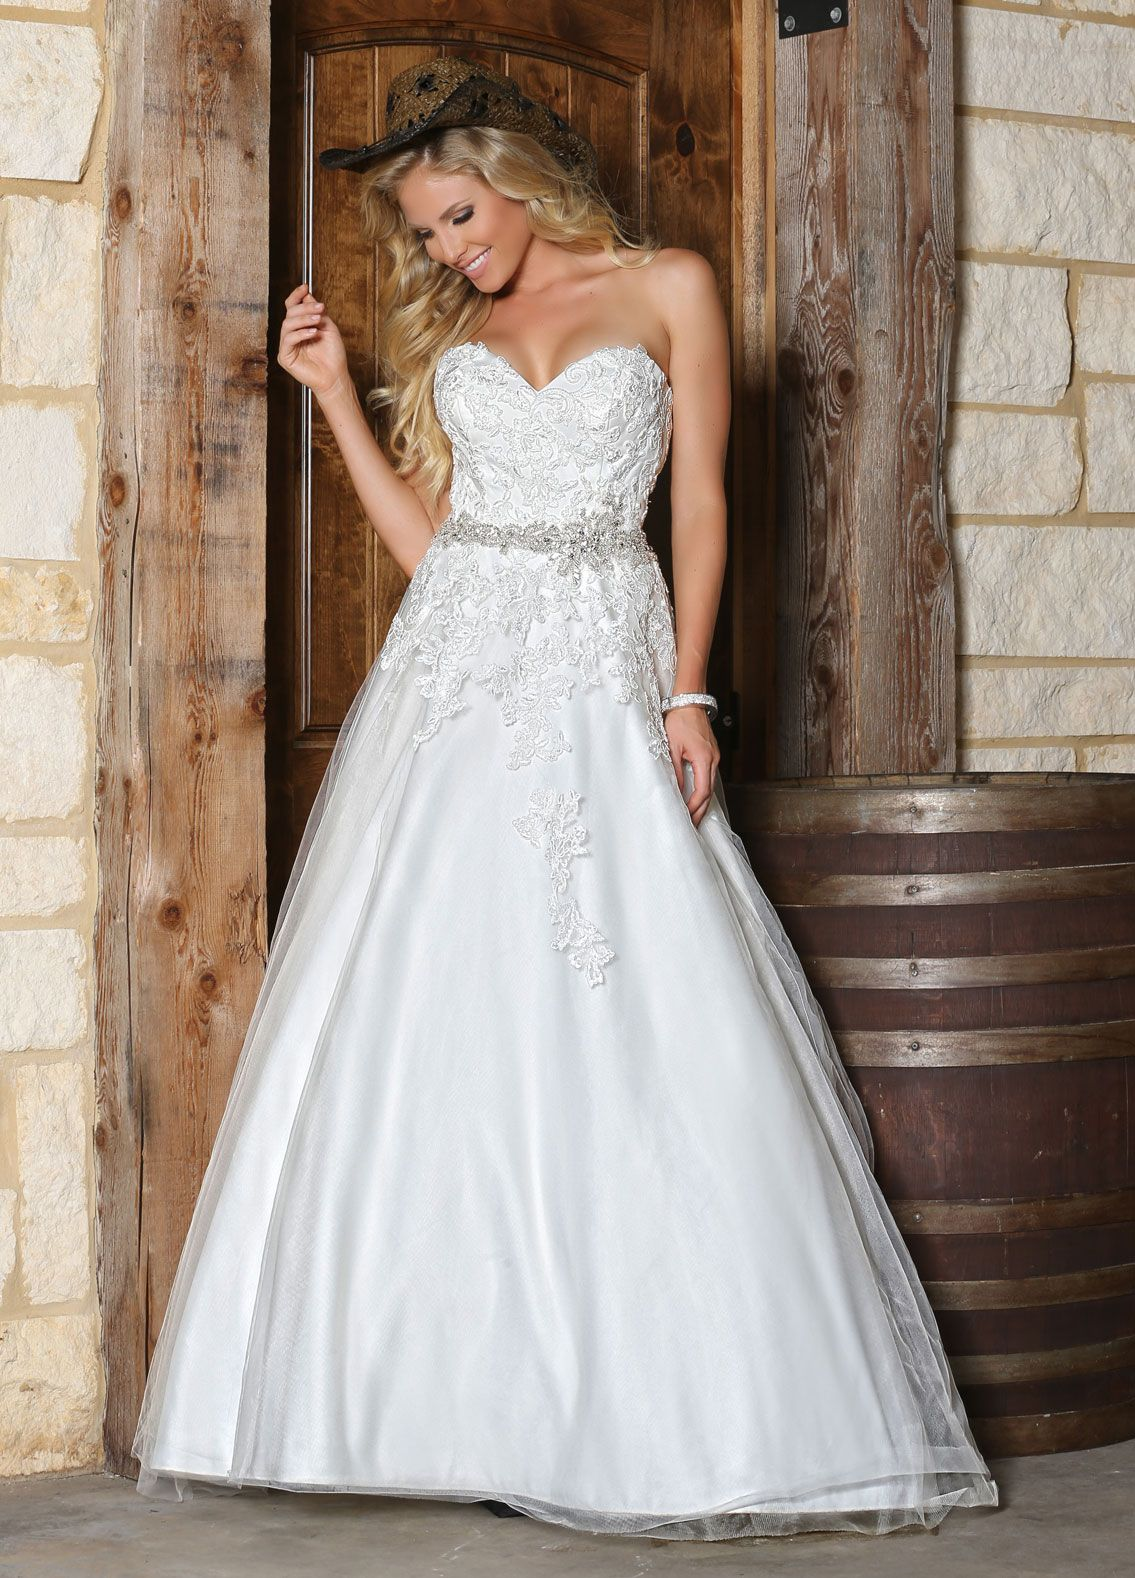 Lace wedding dress designers  DaVinci Bridal is your ultimate destination for Bridesmaid Dresses